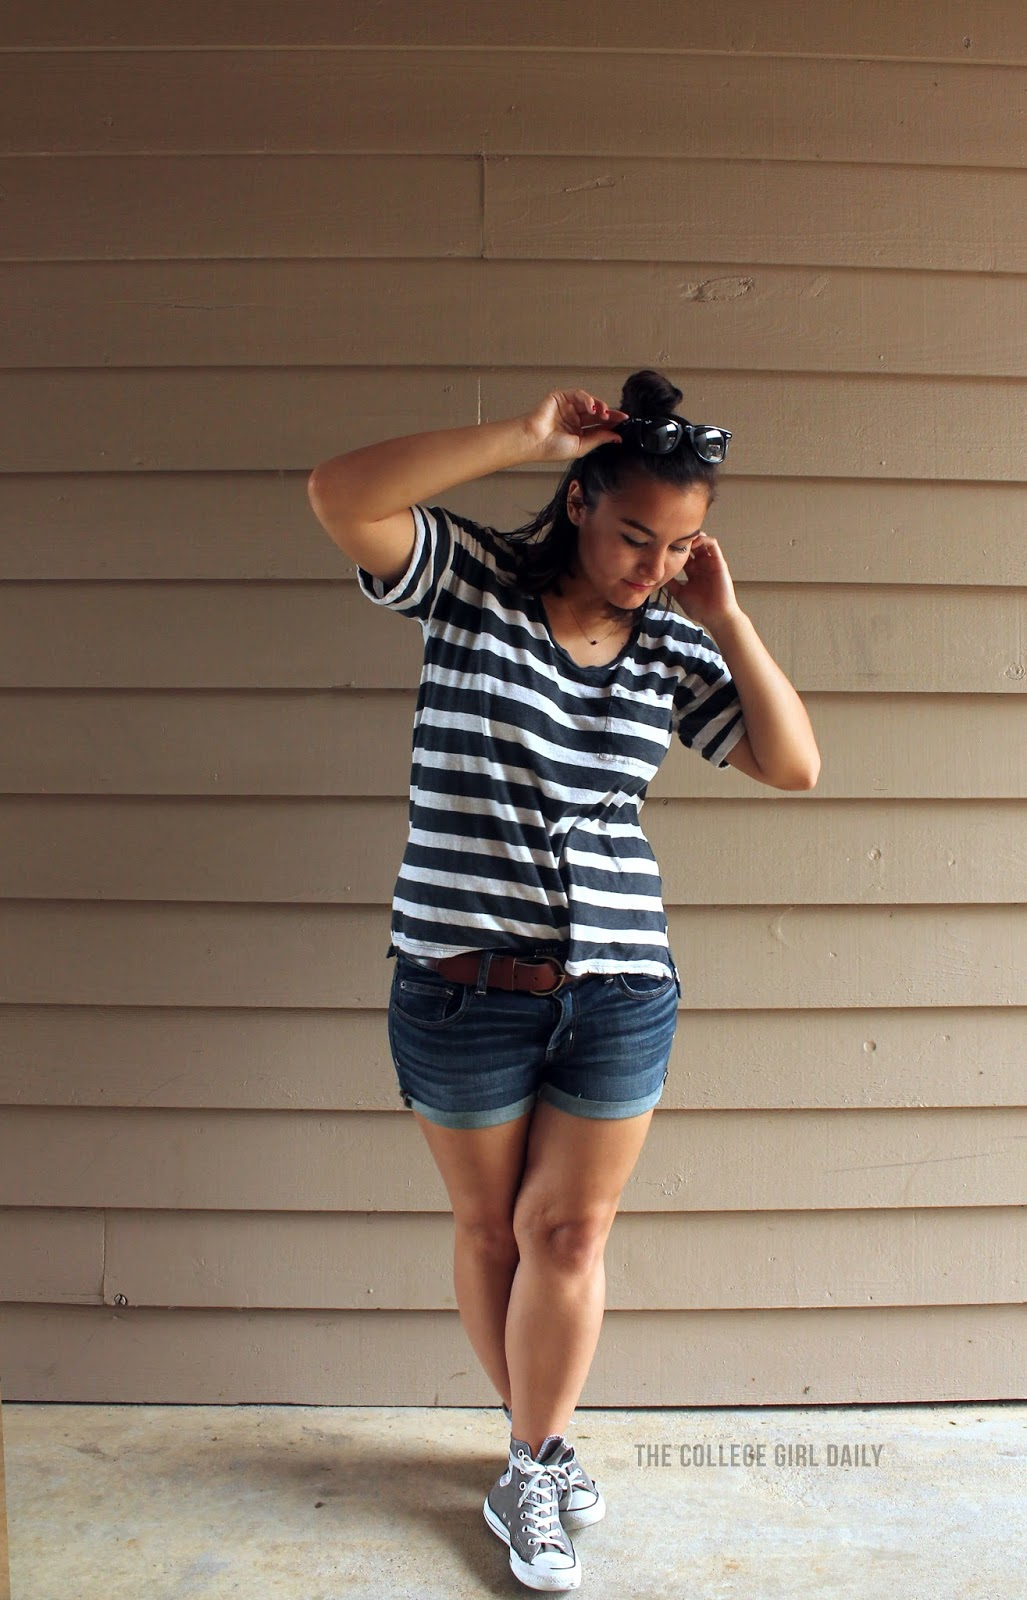 t-shirt, T-shirt, shorts, denim shorts, jorts, sunglasses, ray bands, half bun, stripes, striped, striped t-shirt, converse, high tops, dogeared, loft, loveloft,